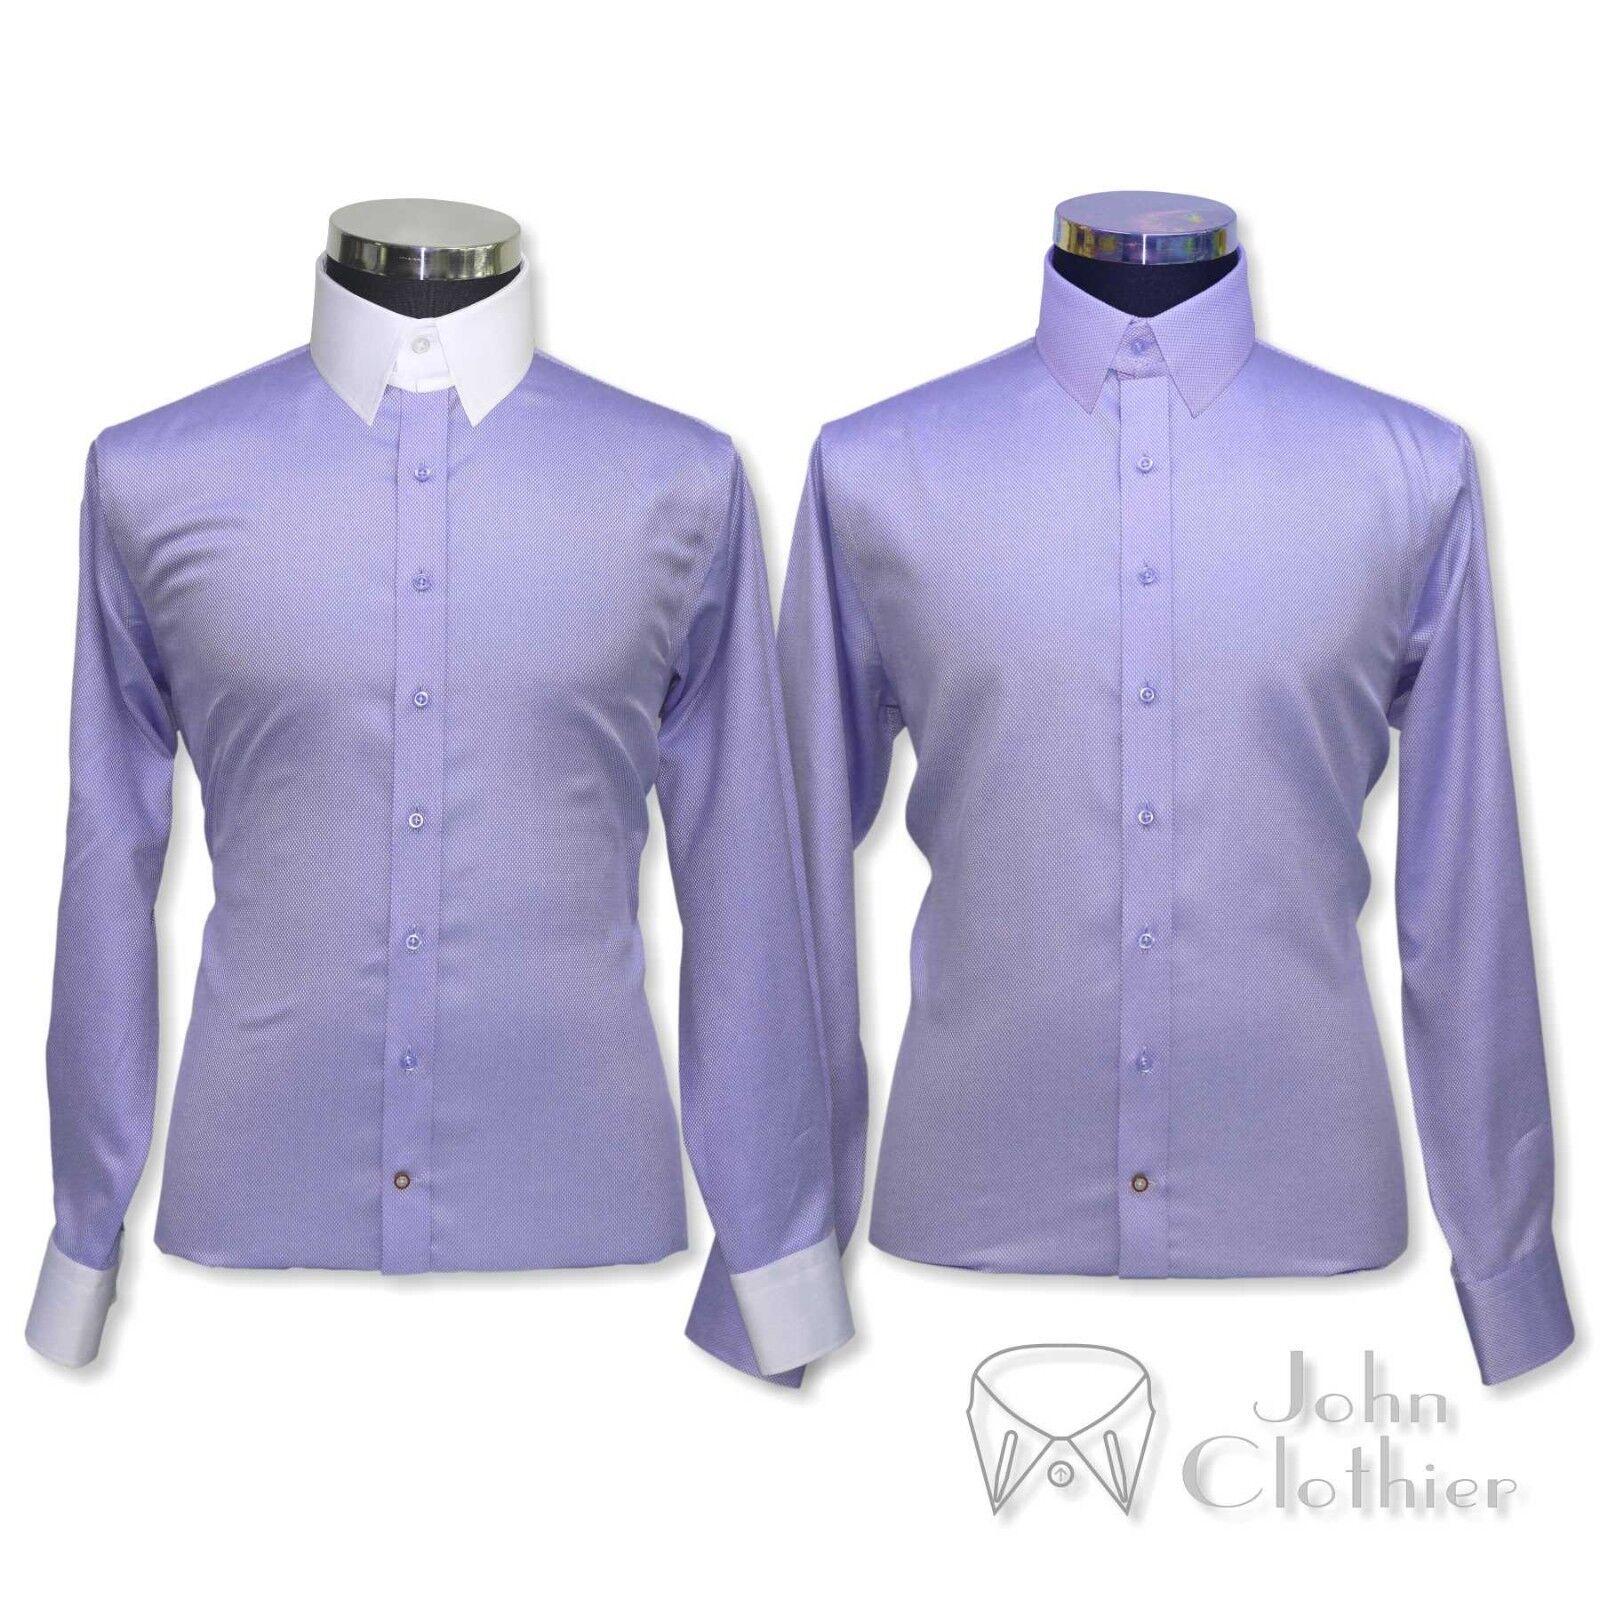 James Bond collar Bankers shirt Men Lilac Diamond Loop collar Gents Tab Cotton